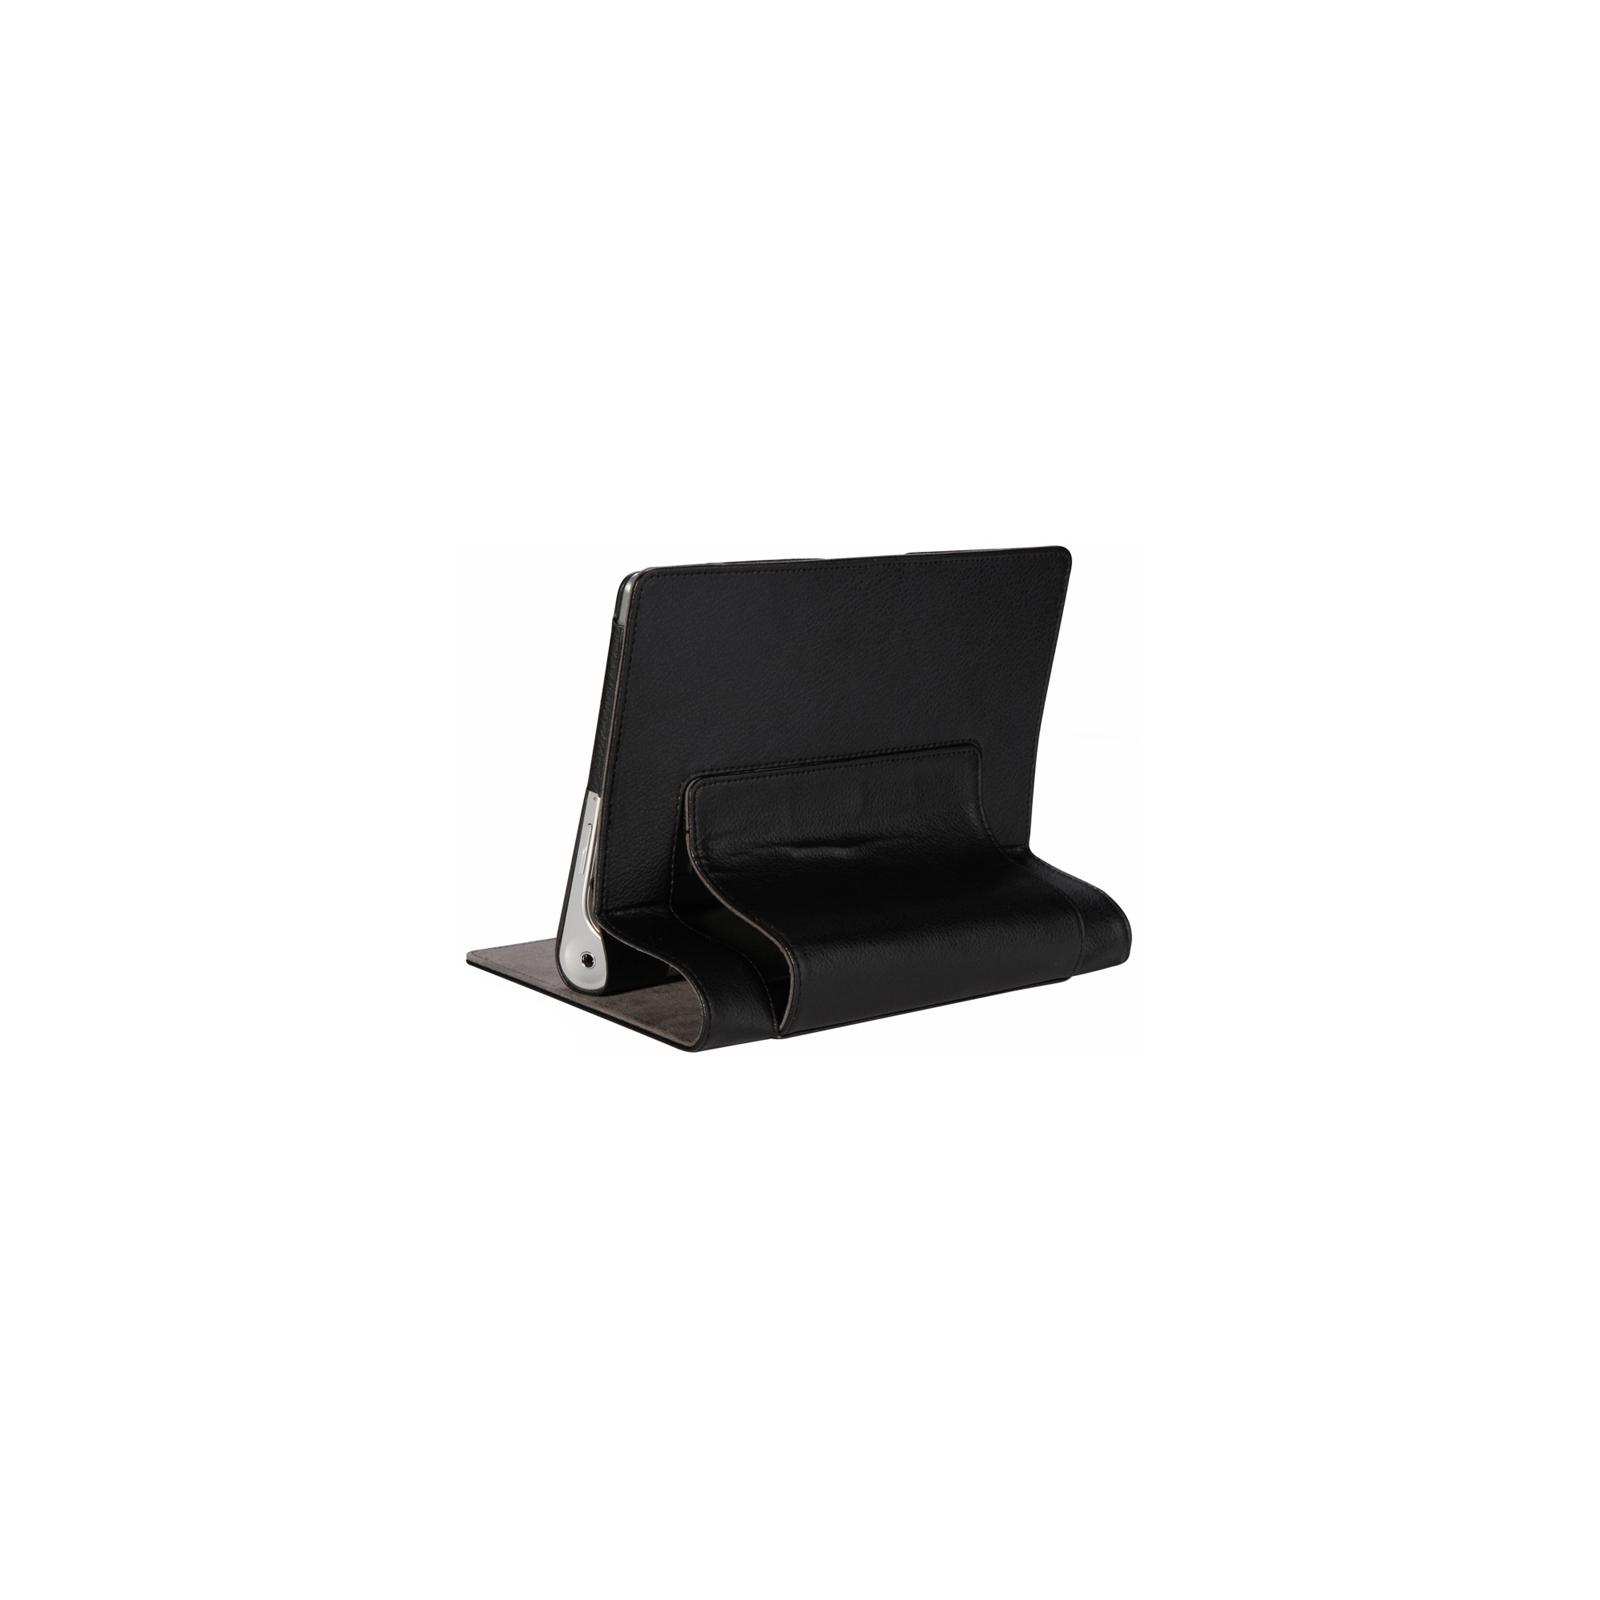 "Чехол для планшета AirOn для Lenovo YOGA Tablet 8"" black (6946795830207)"